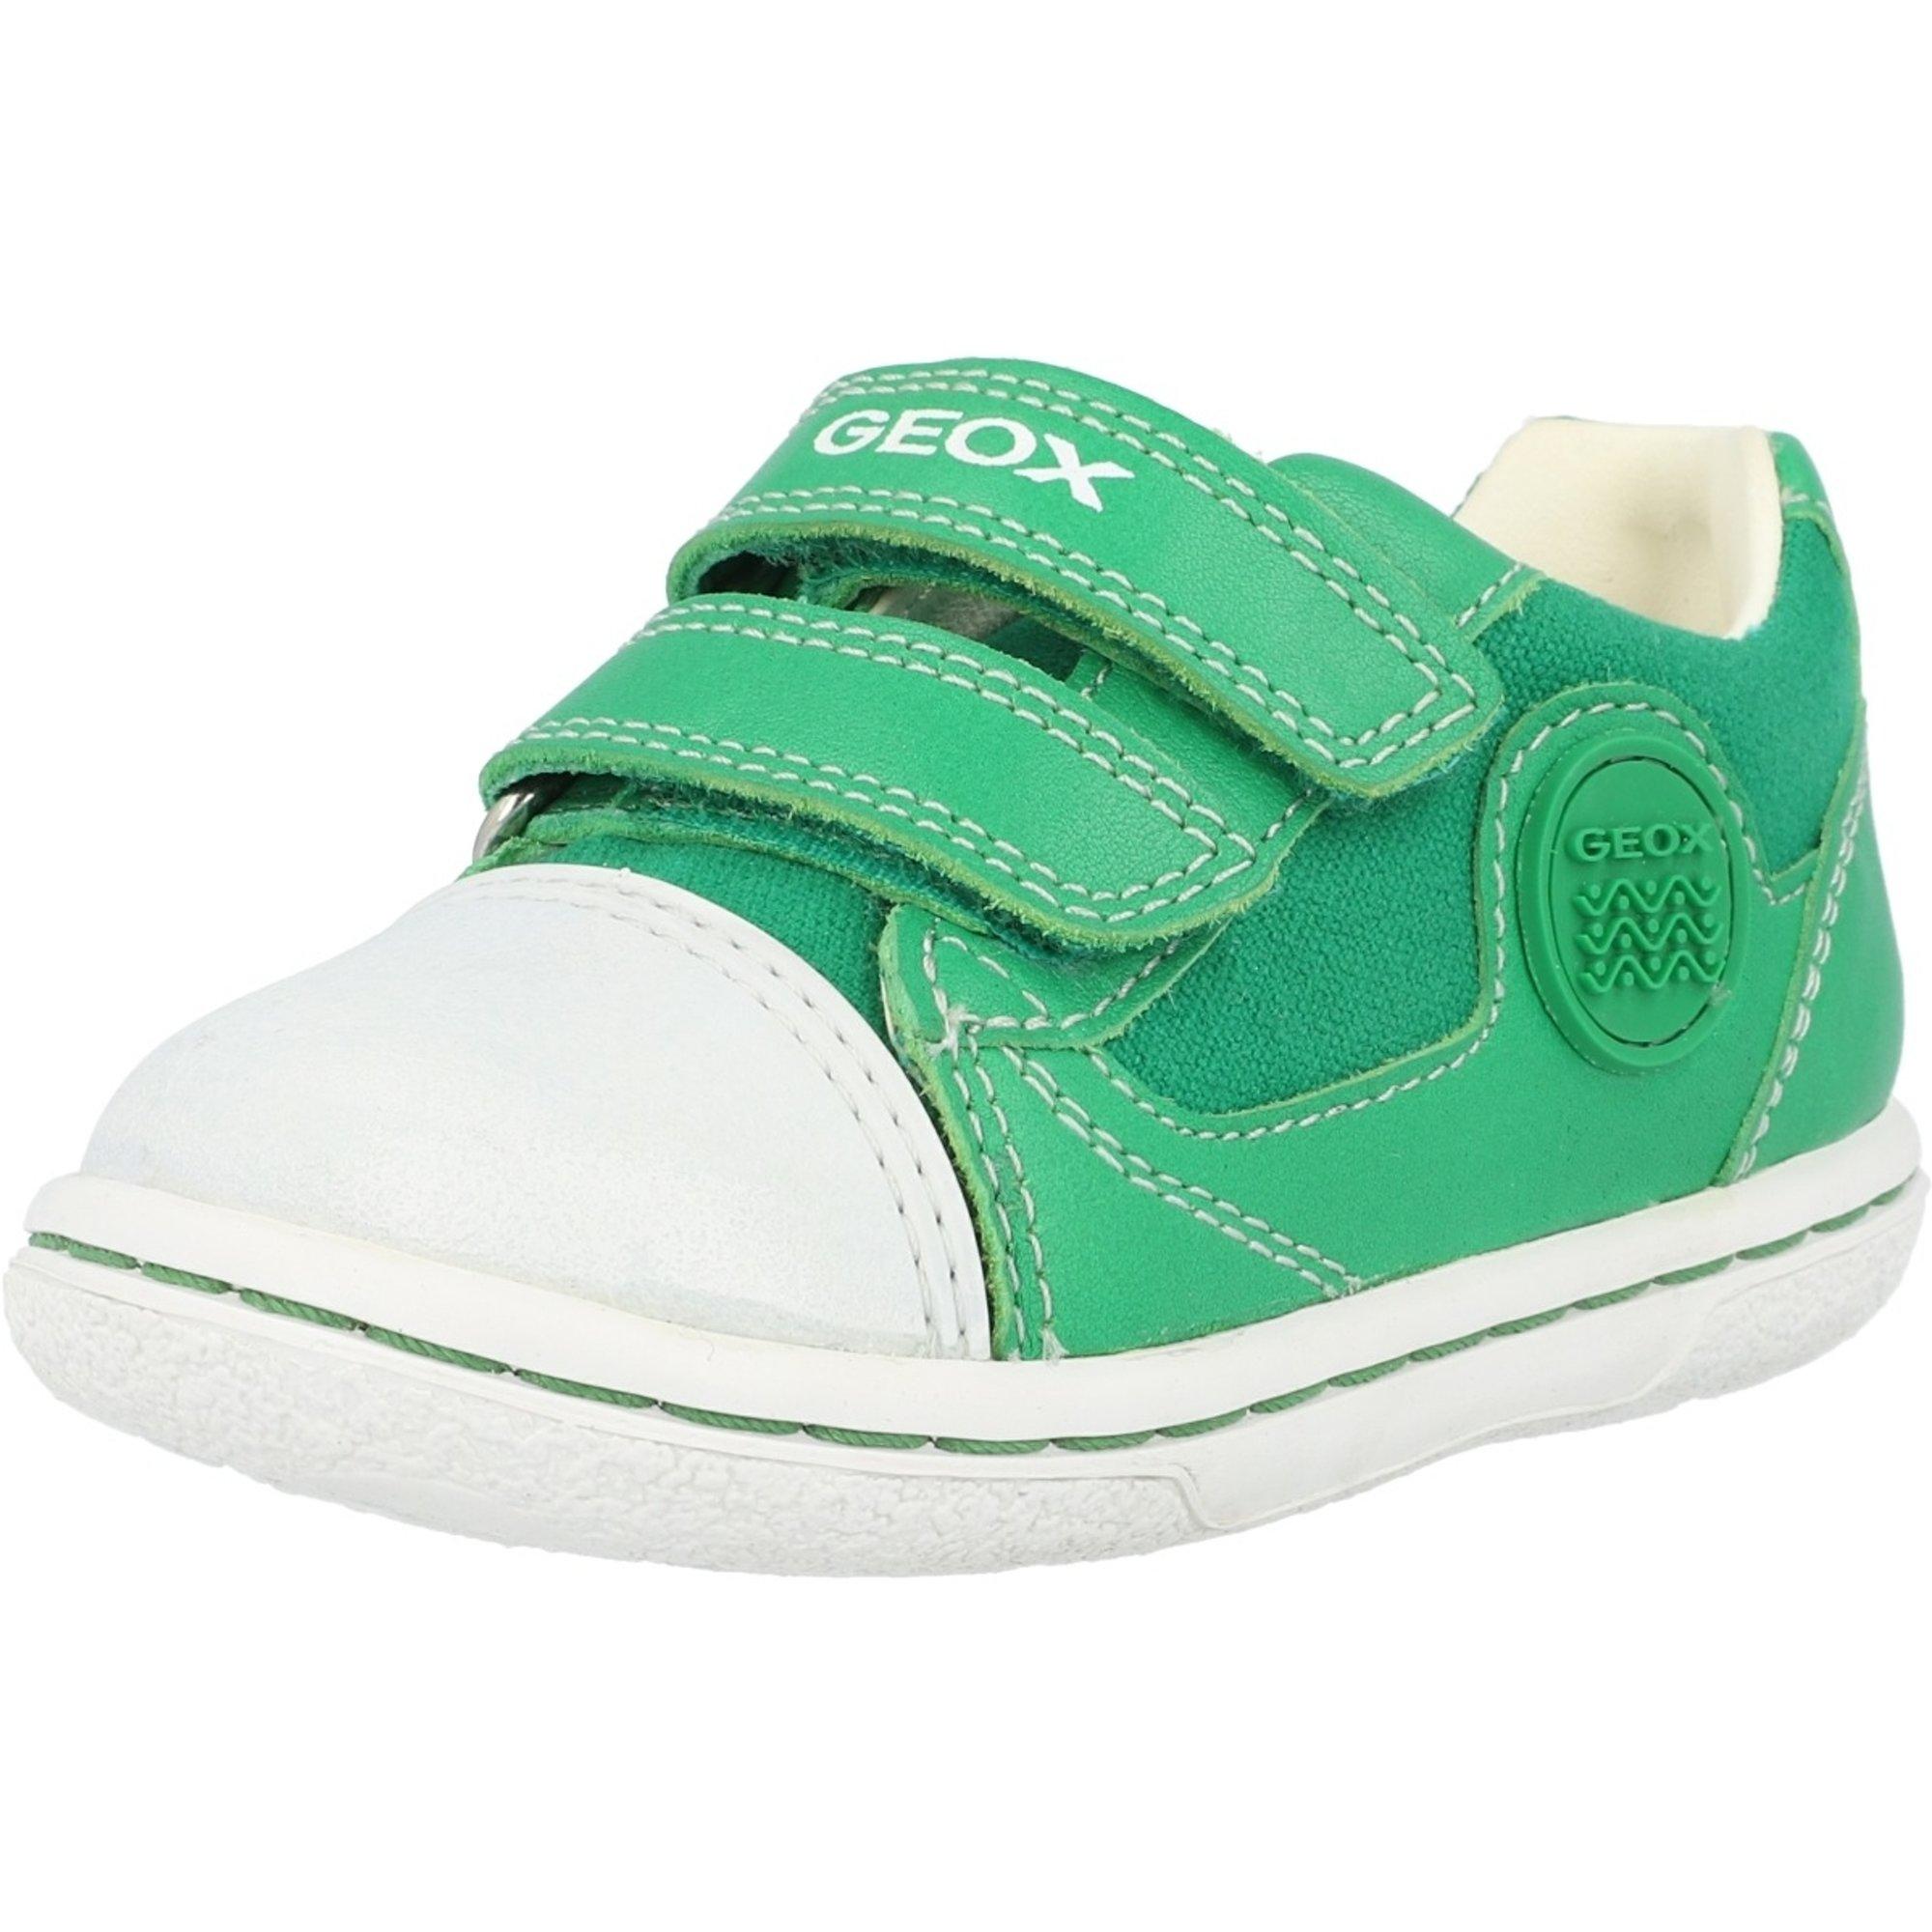 mizuno womens volleyball shoes size 8 x 2 inch jack en zaragoza